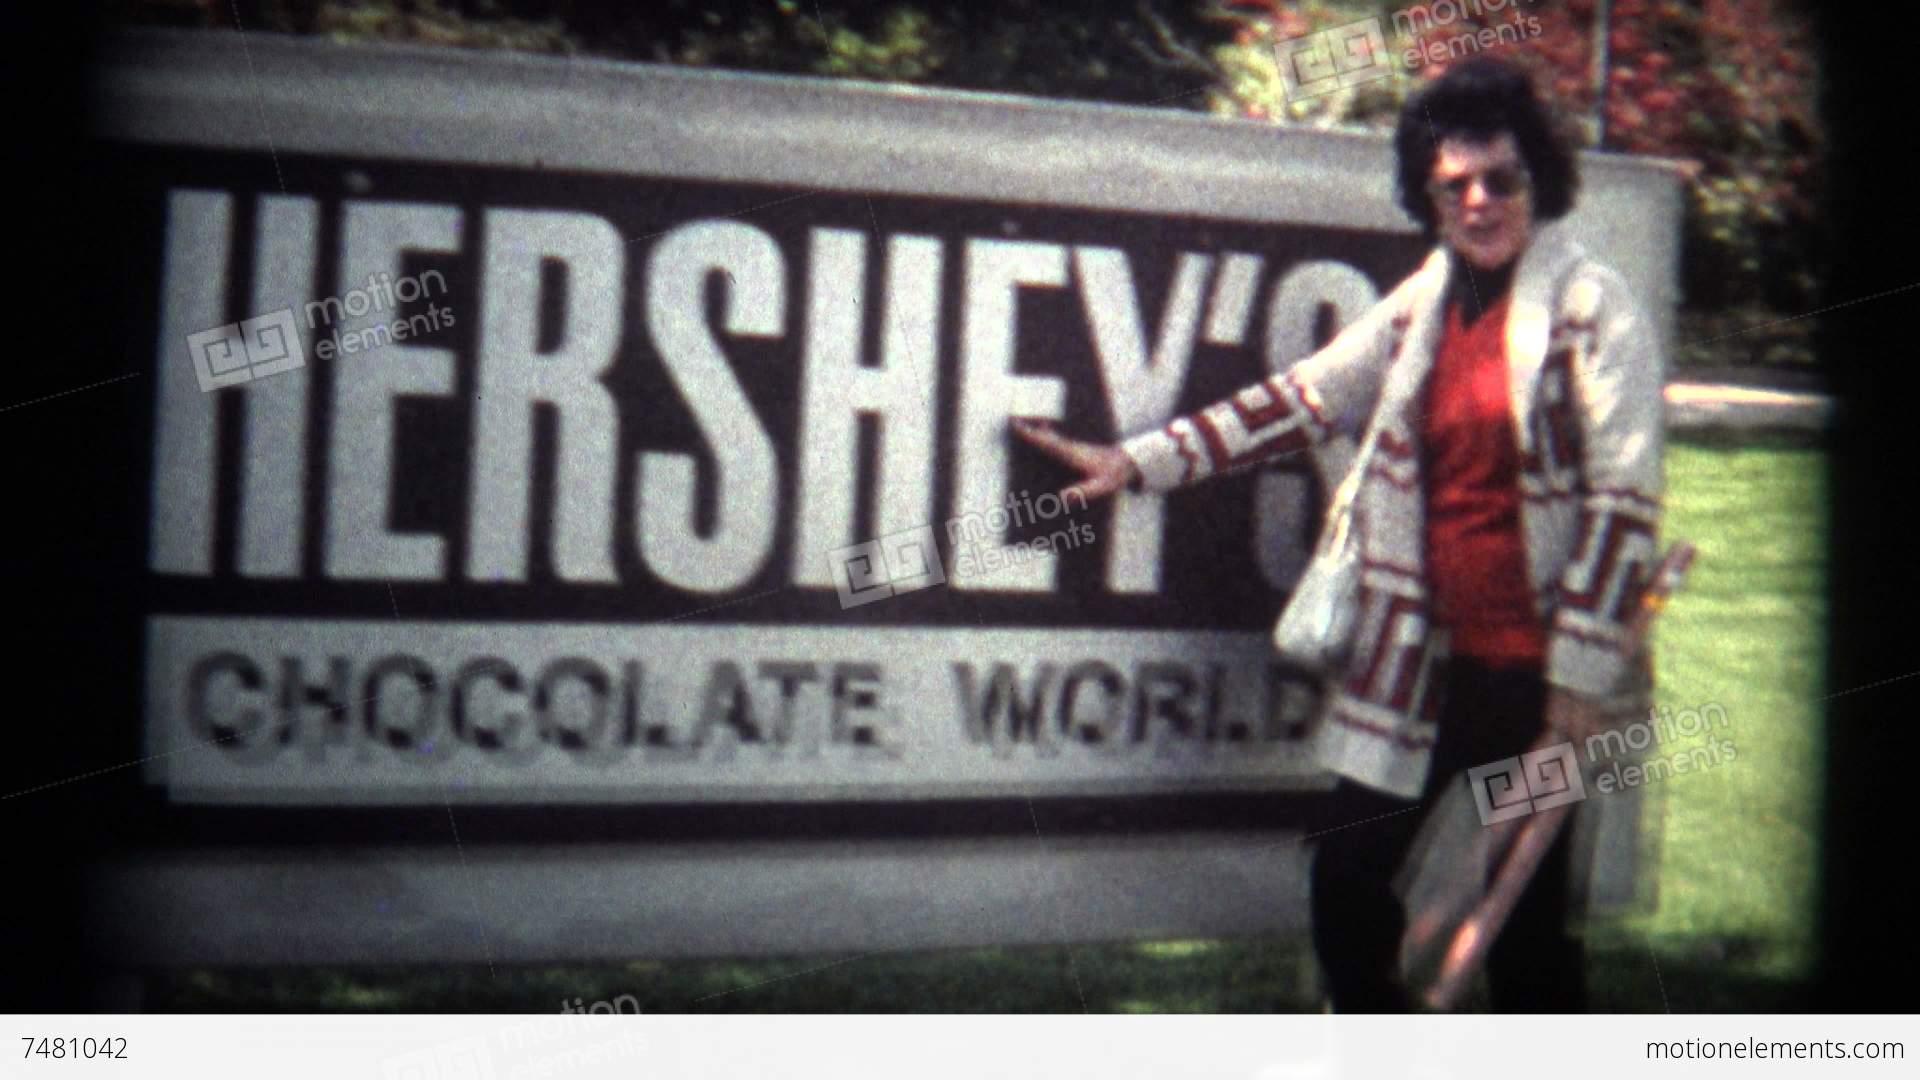 super 8 film hershey chocolate visit 1974 stock video. Black Bedroom Furniture Sets. Home Design Ideas